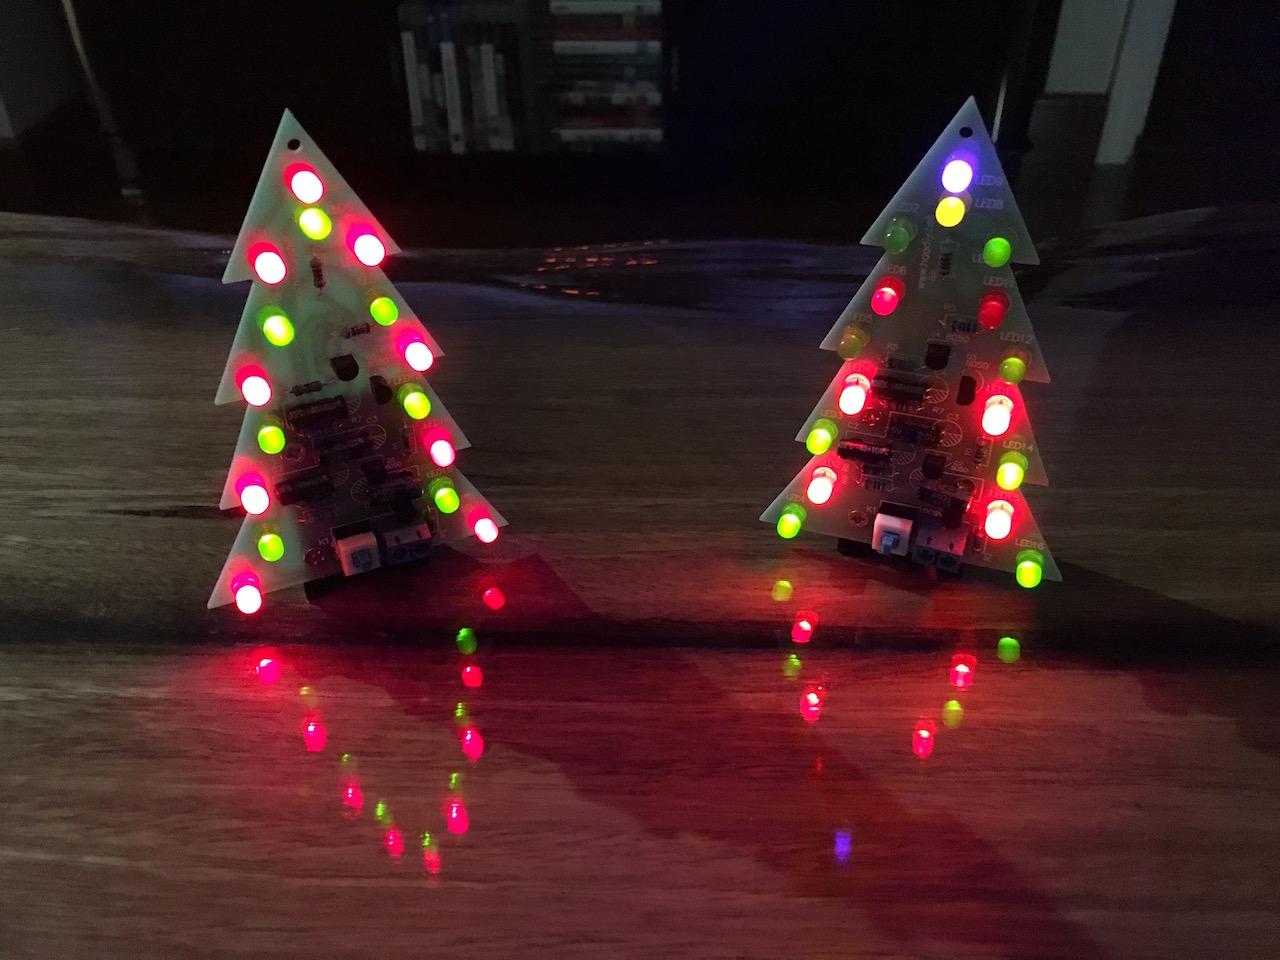 Gallery: Christmas Tree Flash LED Electronic DIY Learning Kit (SKU180142) |  Igor Kromin